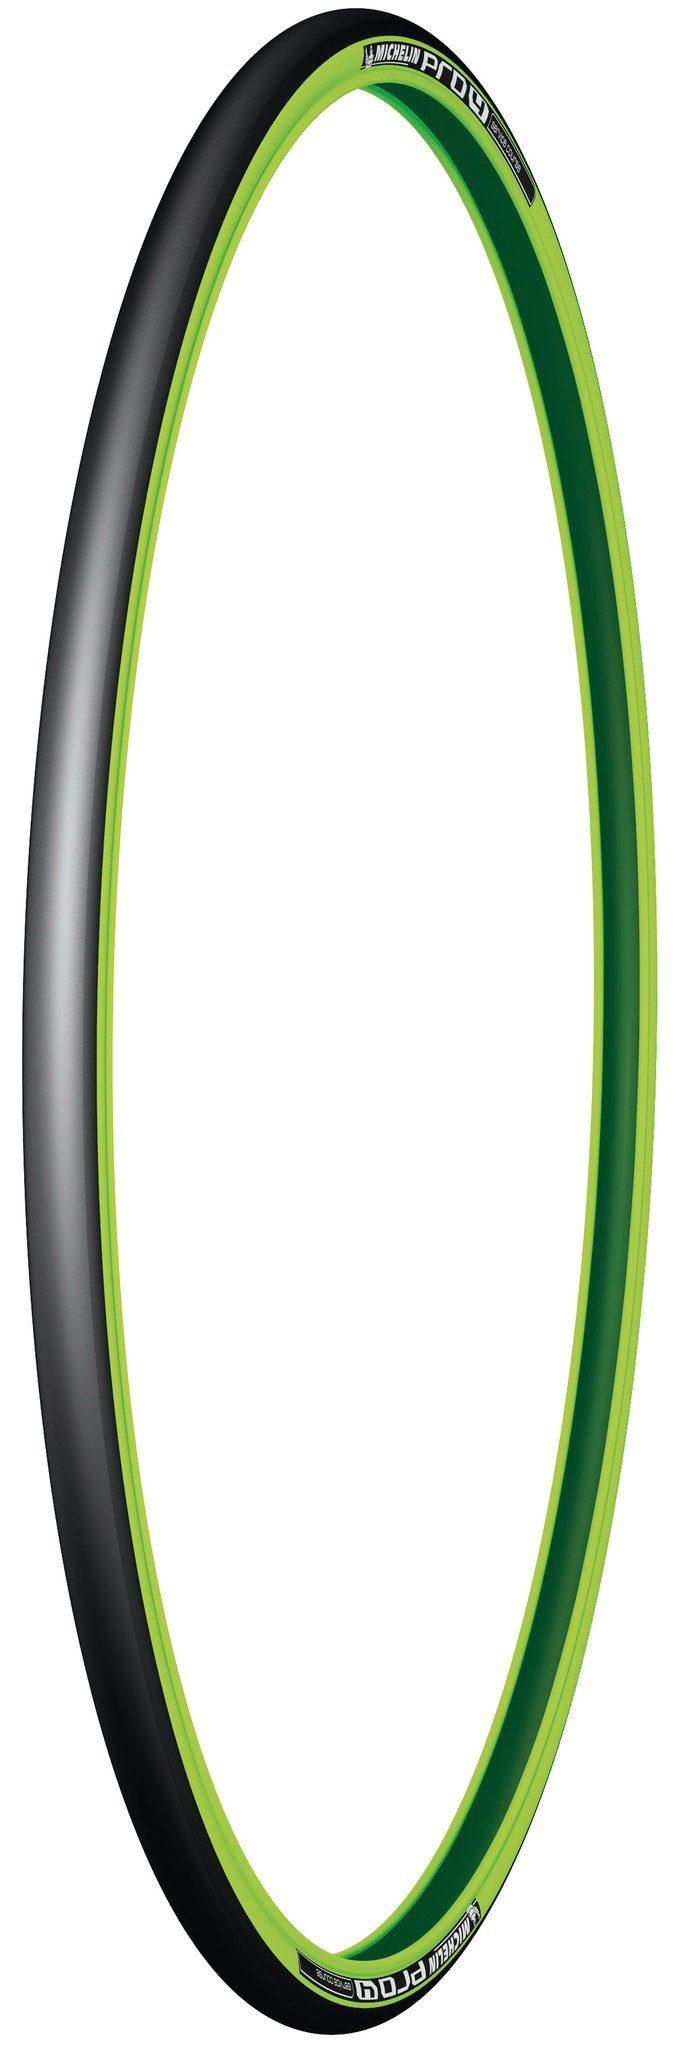 Michelin Fahrradreifen »Pro4 V2«